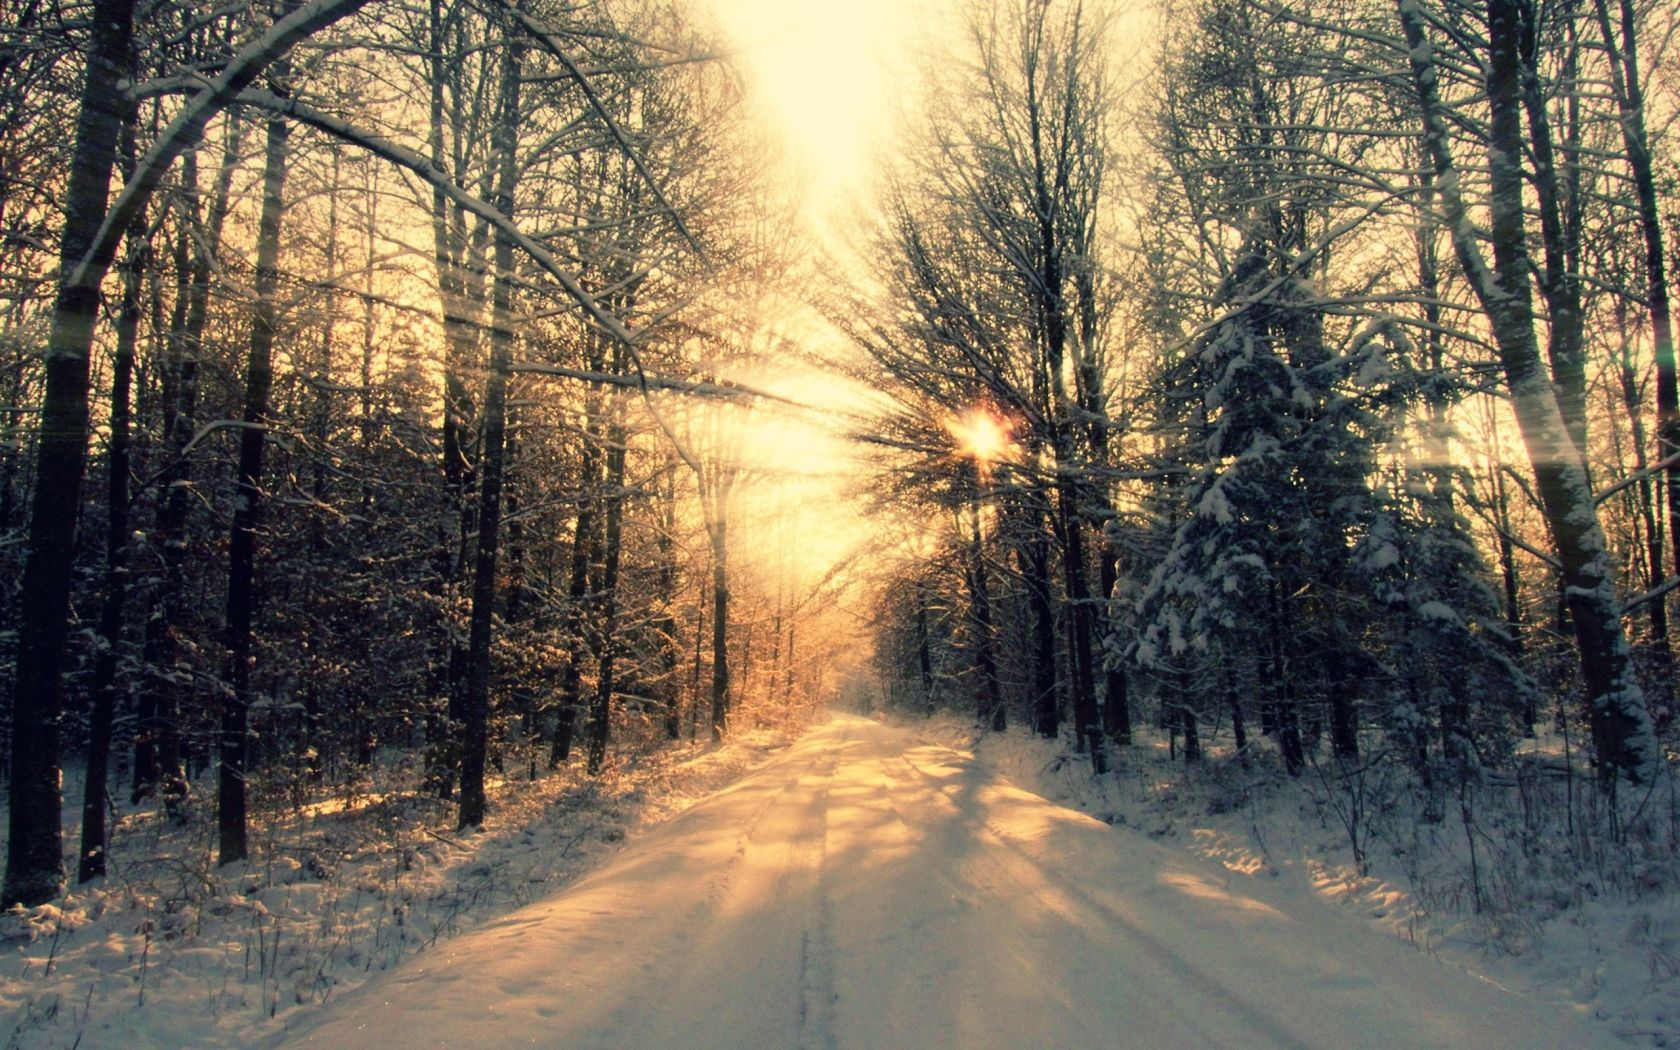 Winter Wallpaper Tumblr 1080p, Lugares